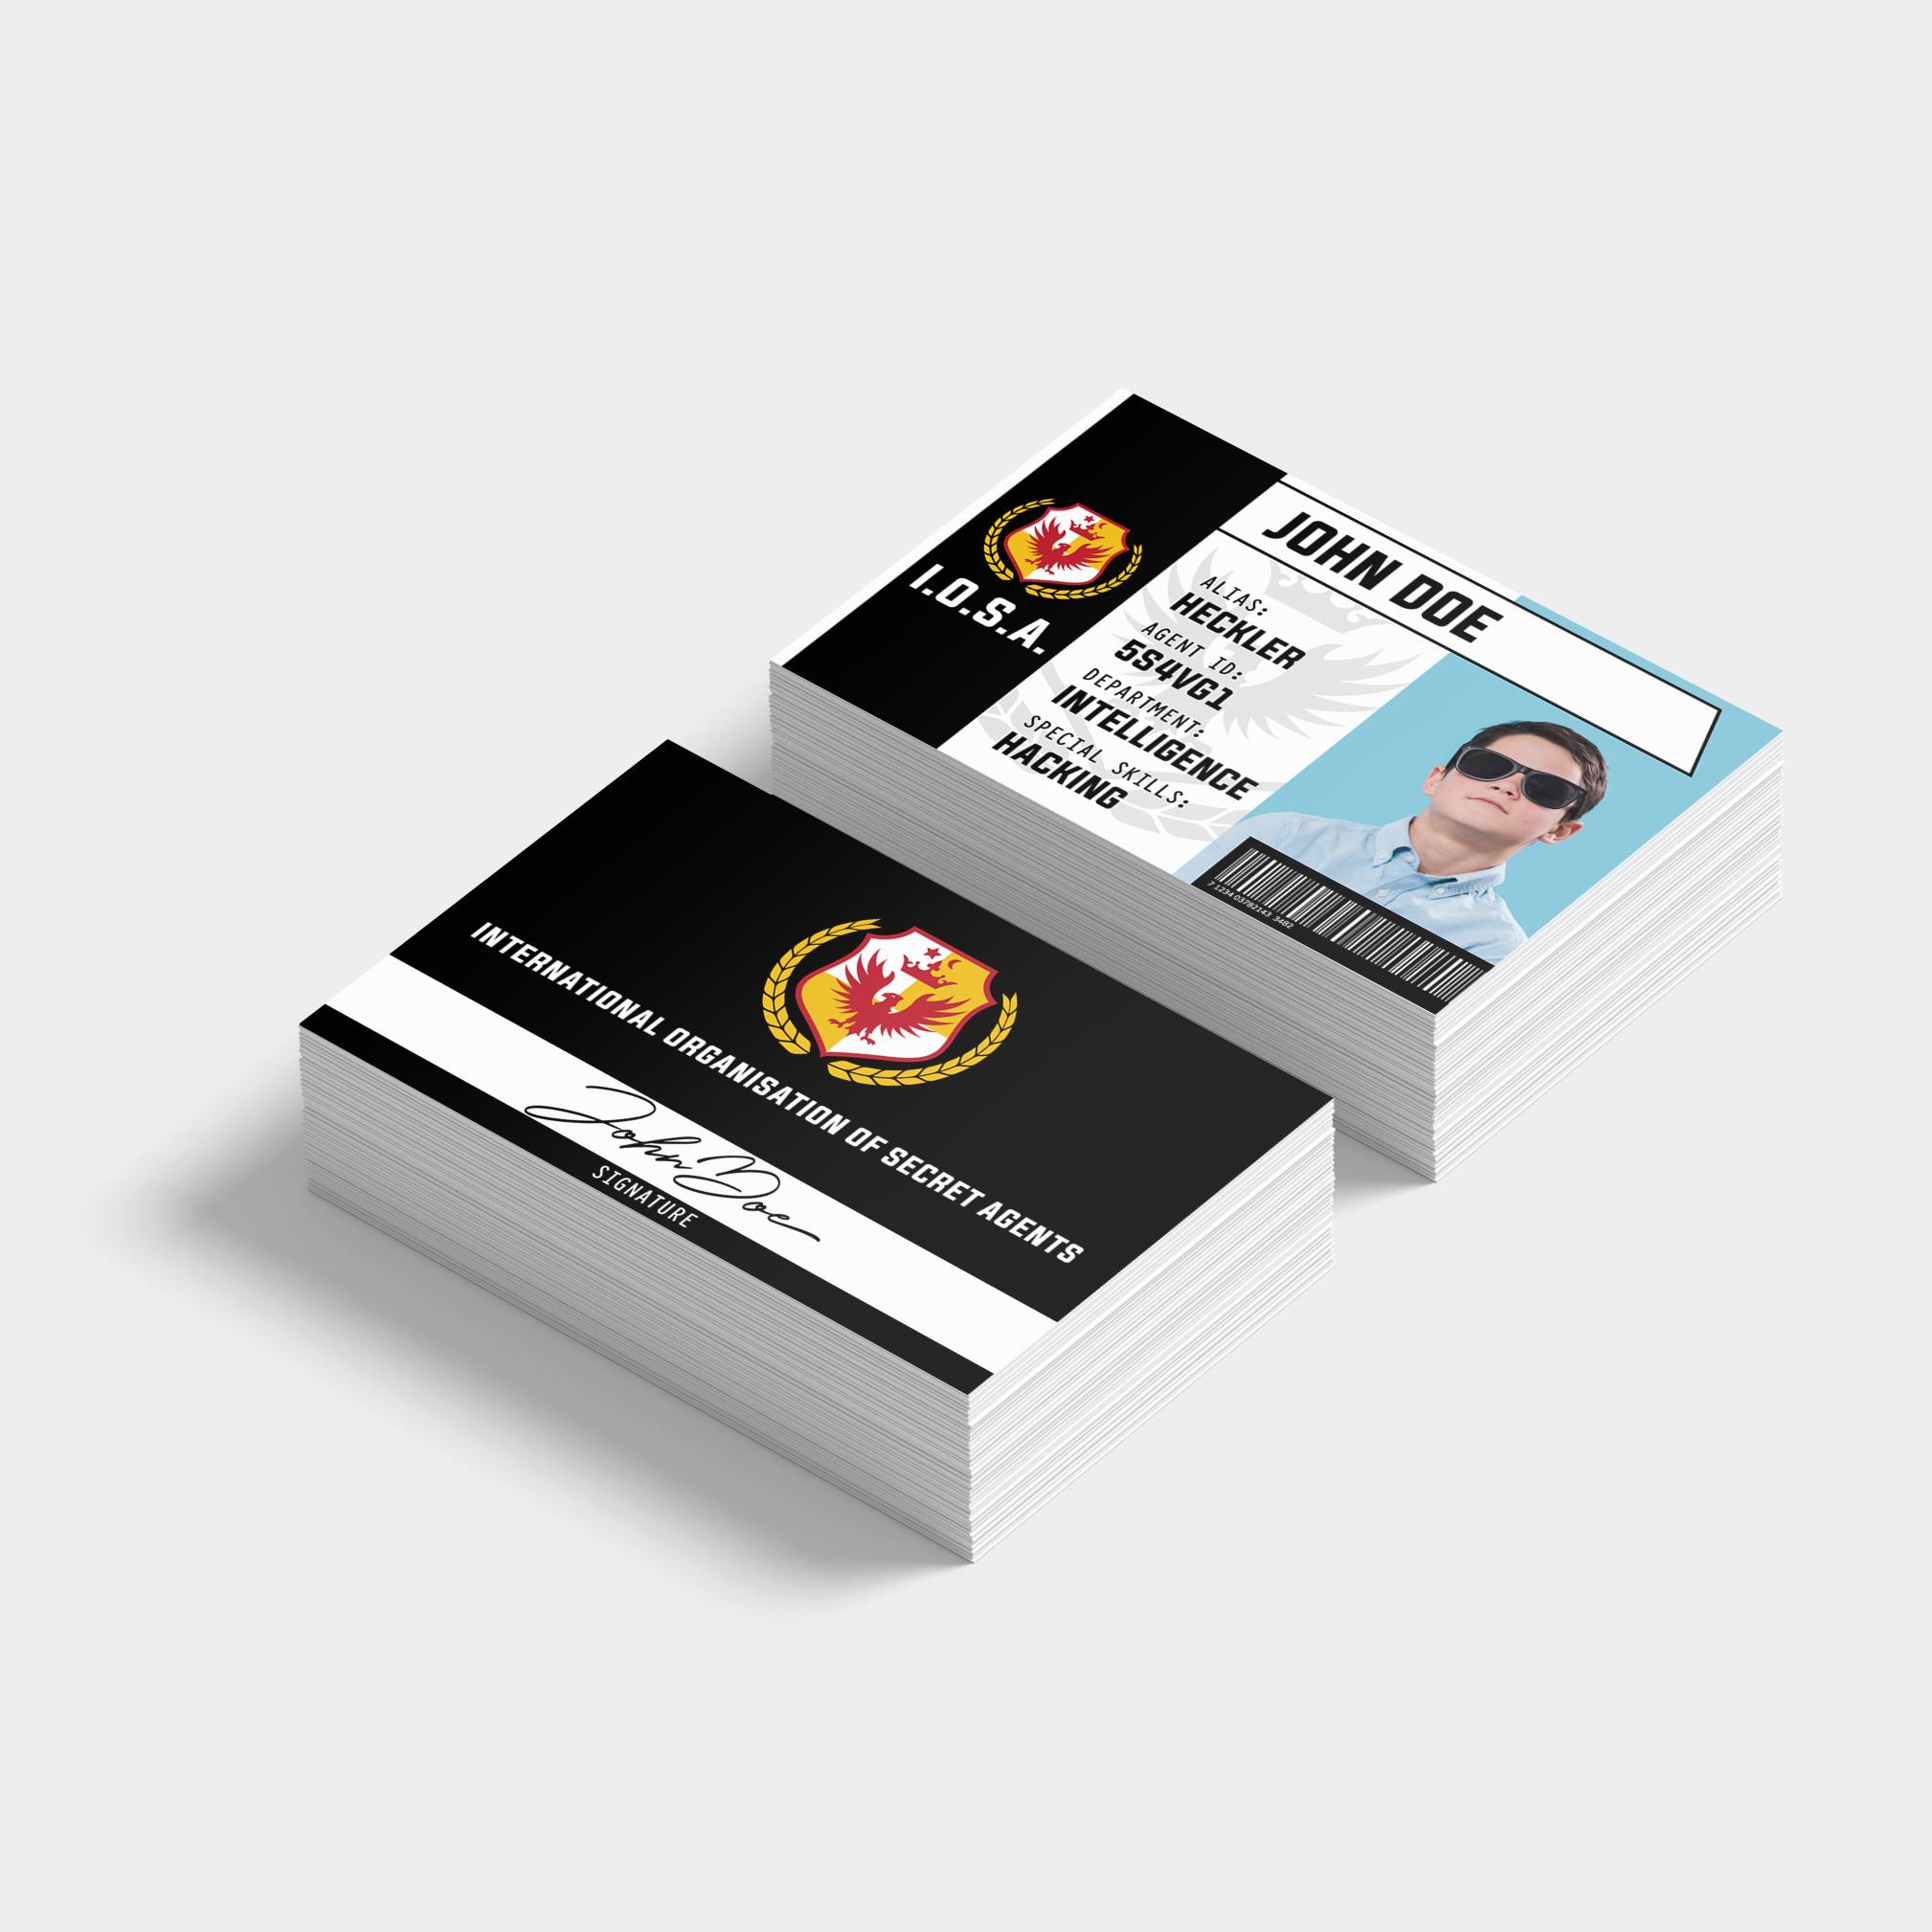 Secret Agent Namecards (85 x 55mm) - $16.00/ box of 100 cards